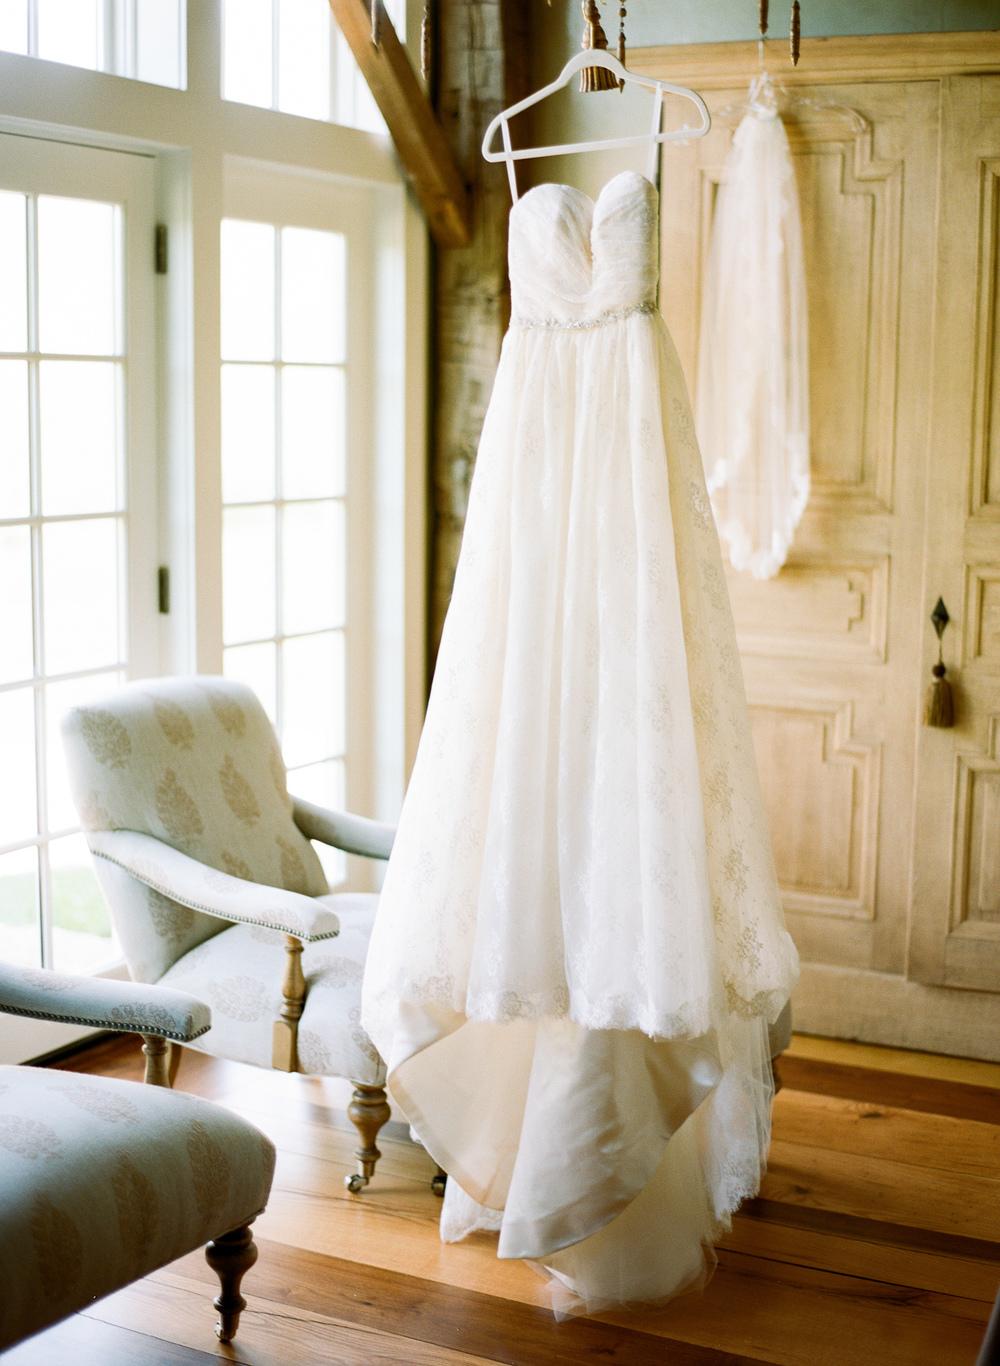 roth_wedding_high_res-004.jpg